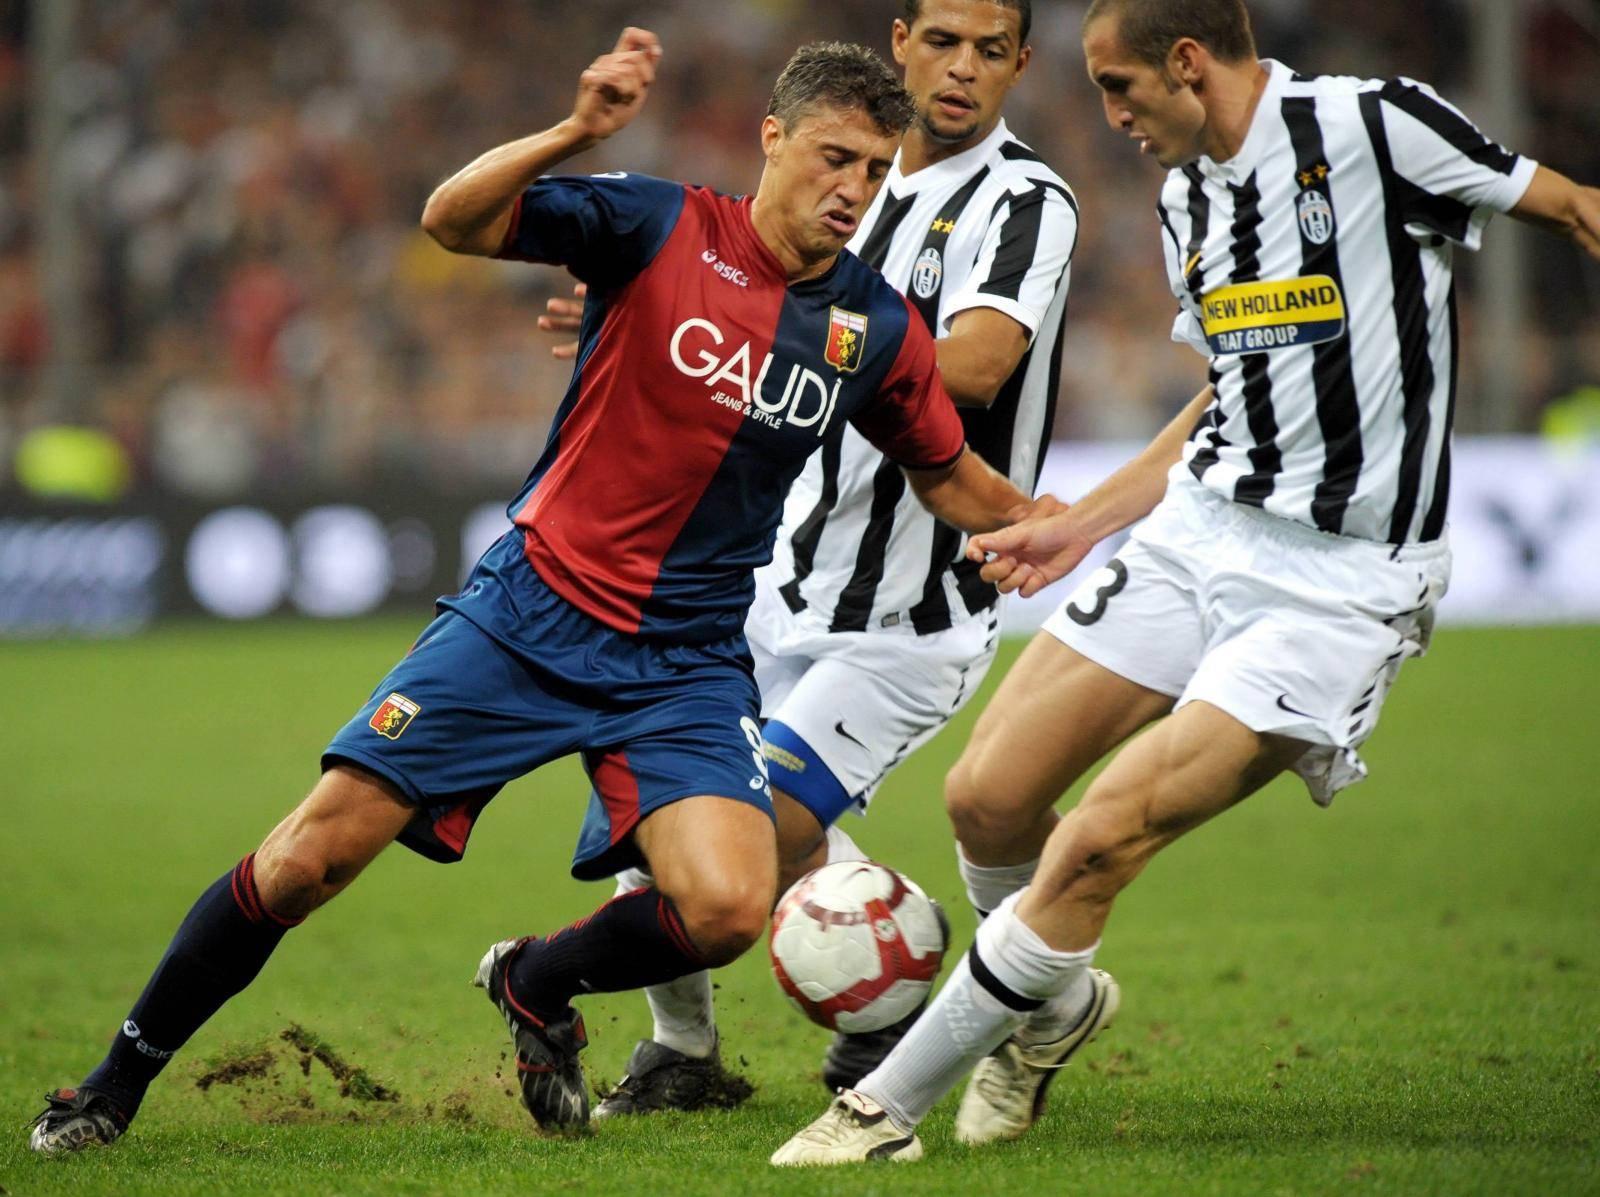 ITA, Serie A, Genoa vs Juventus Turin